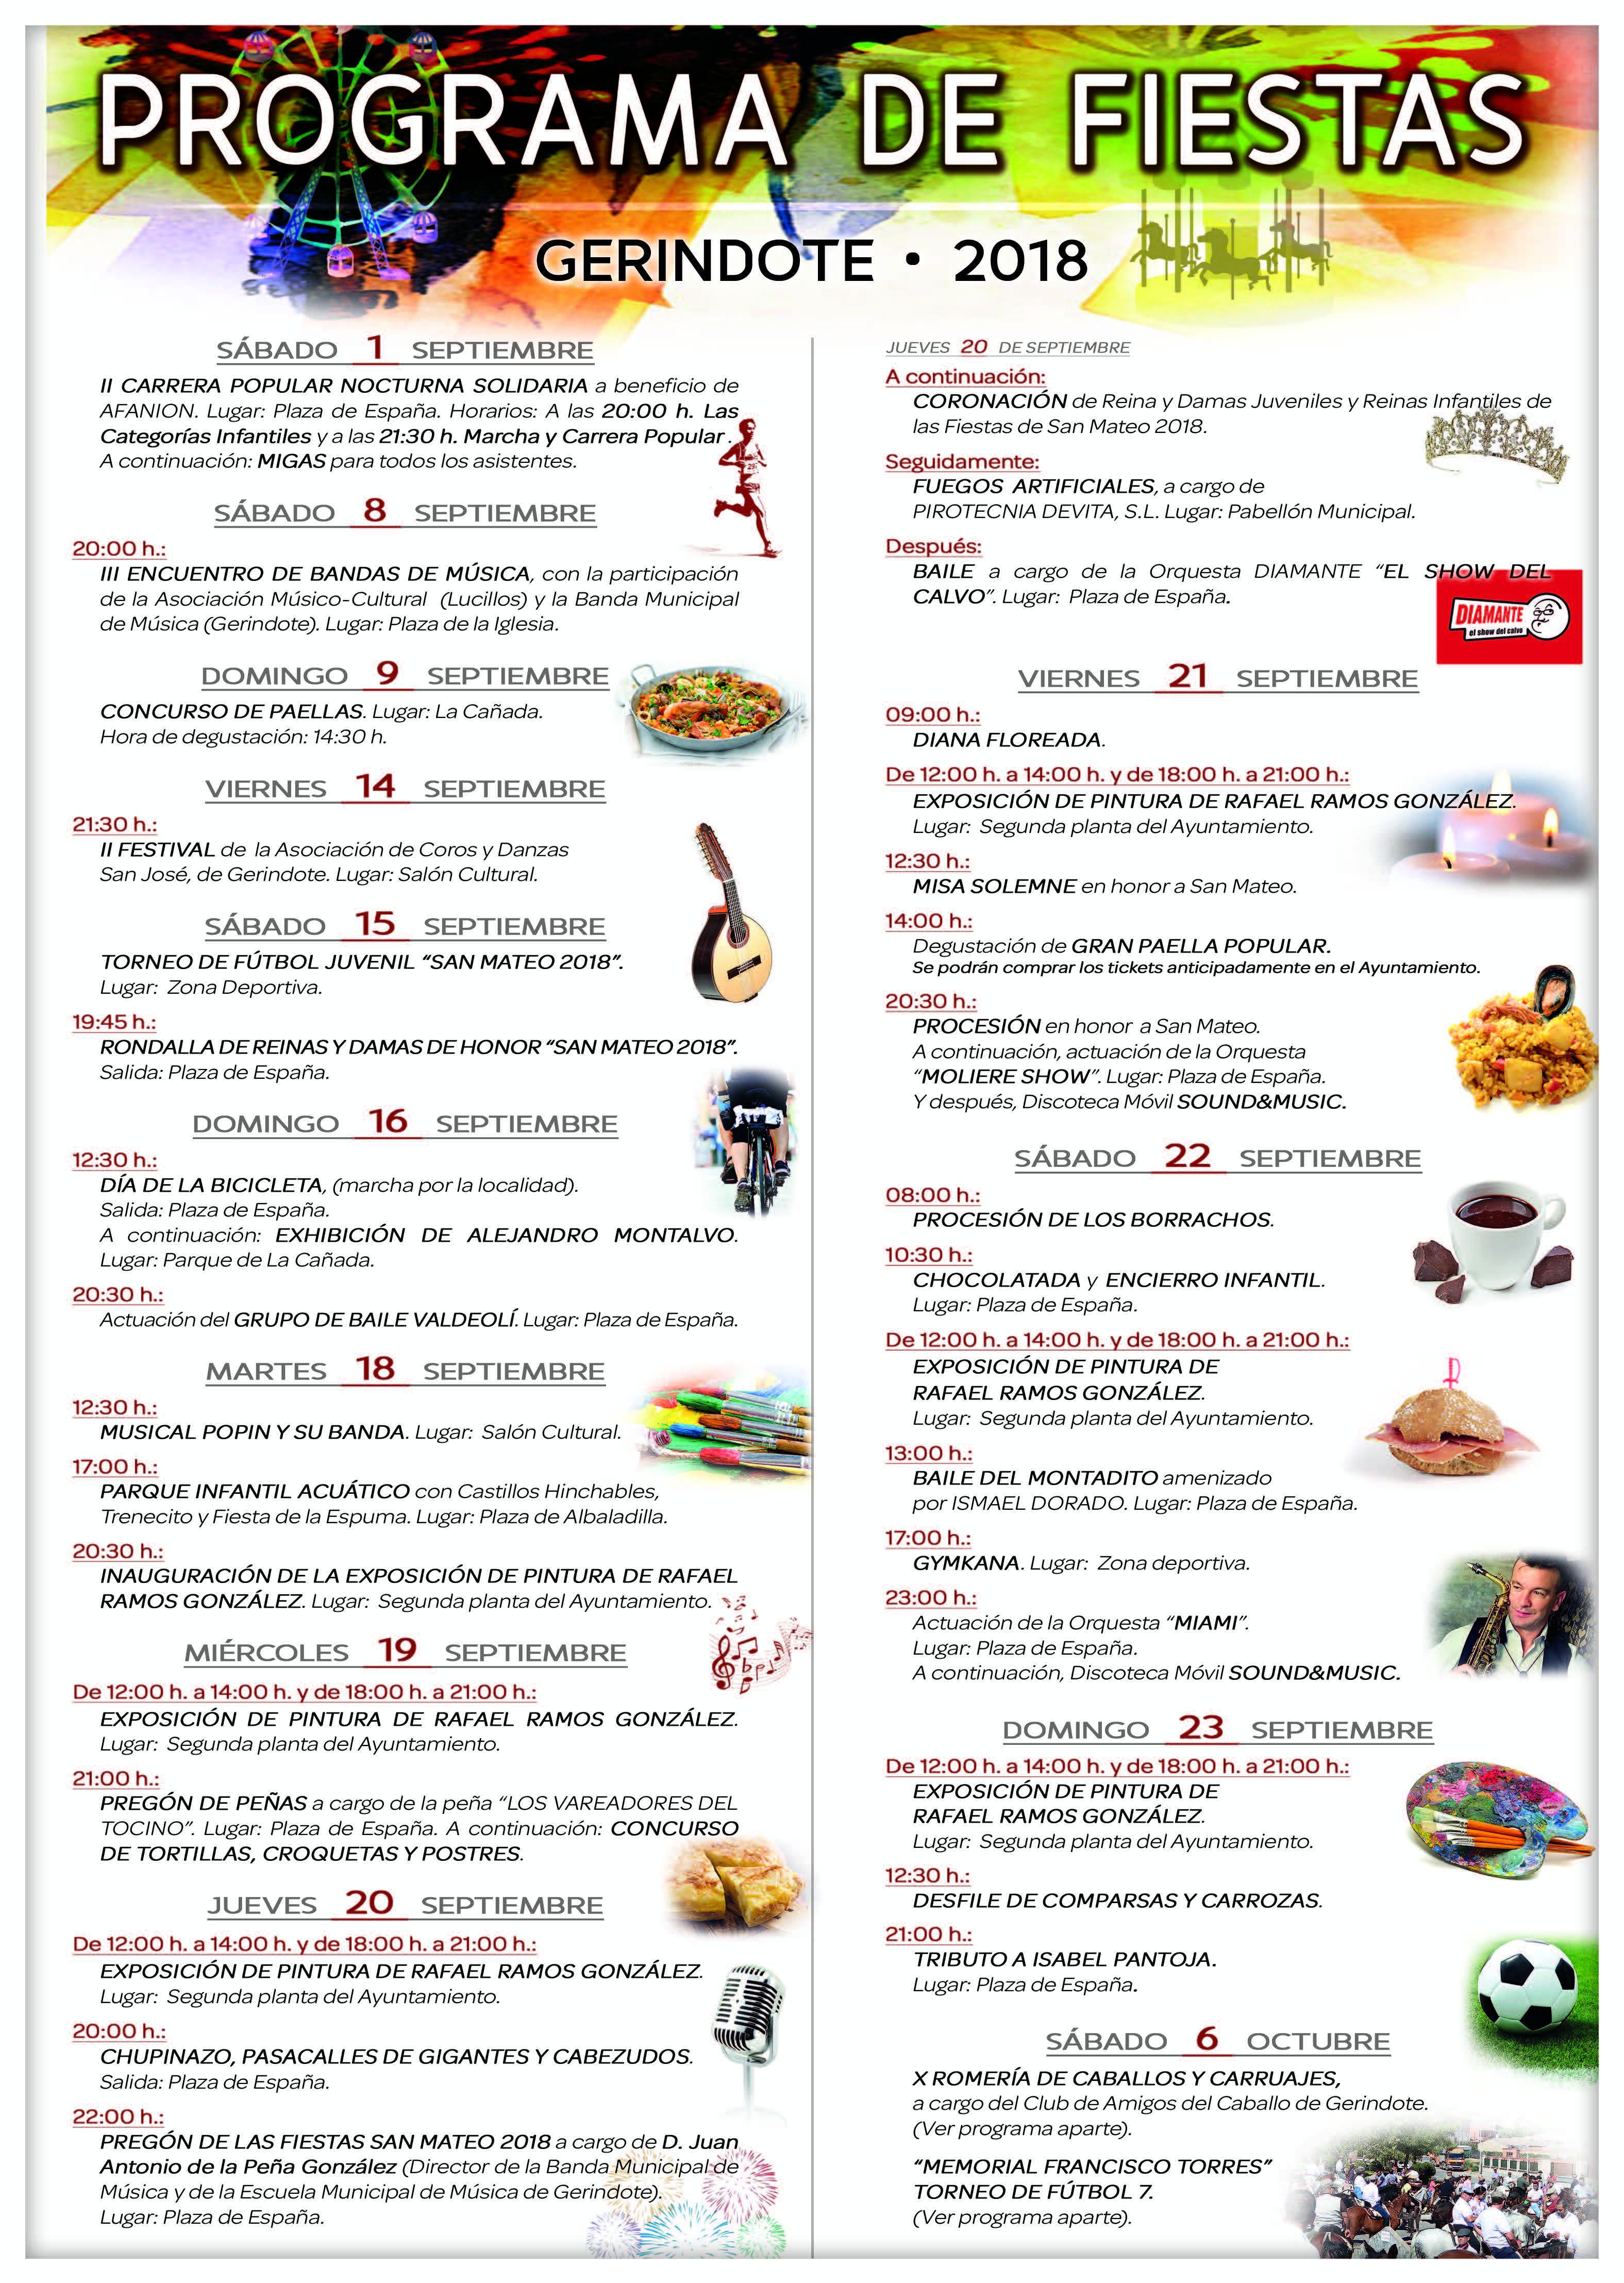 Fiestas GERINDOTE 2018 cartel